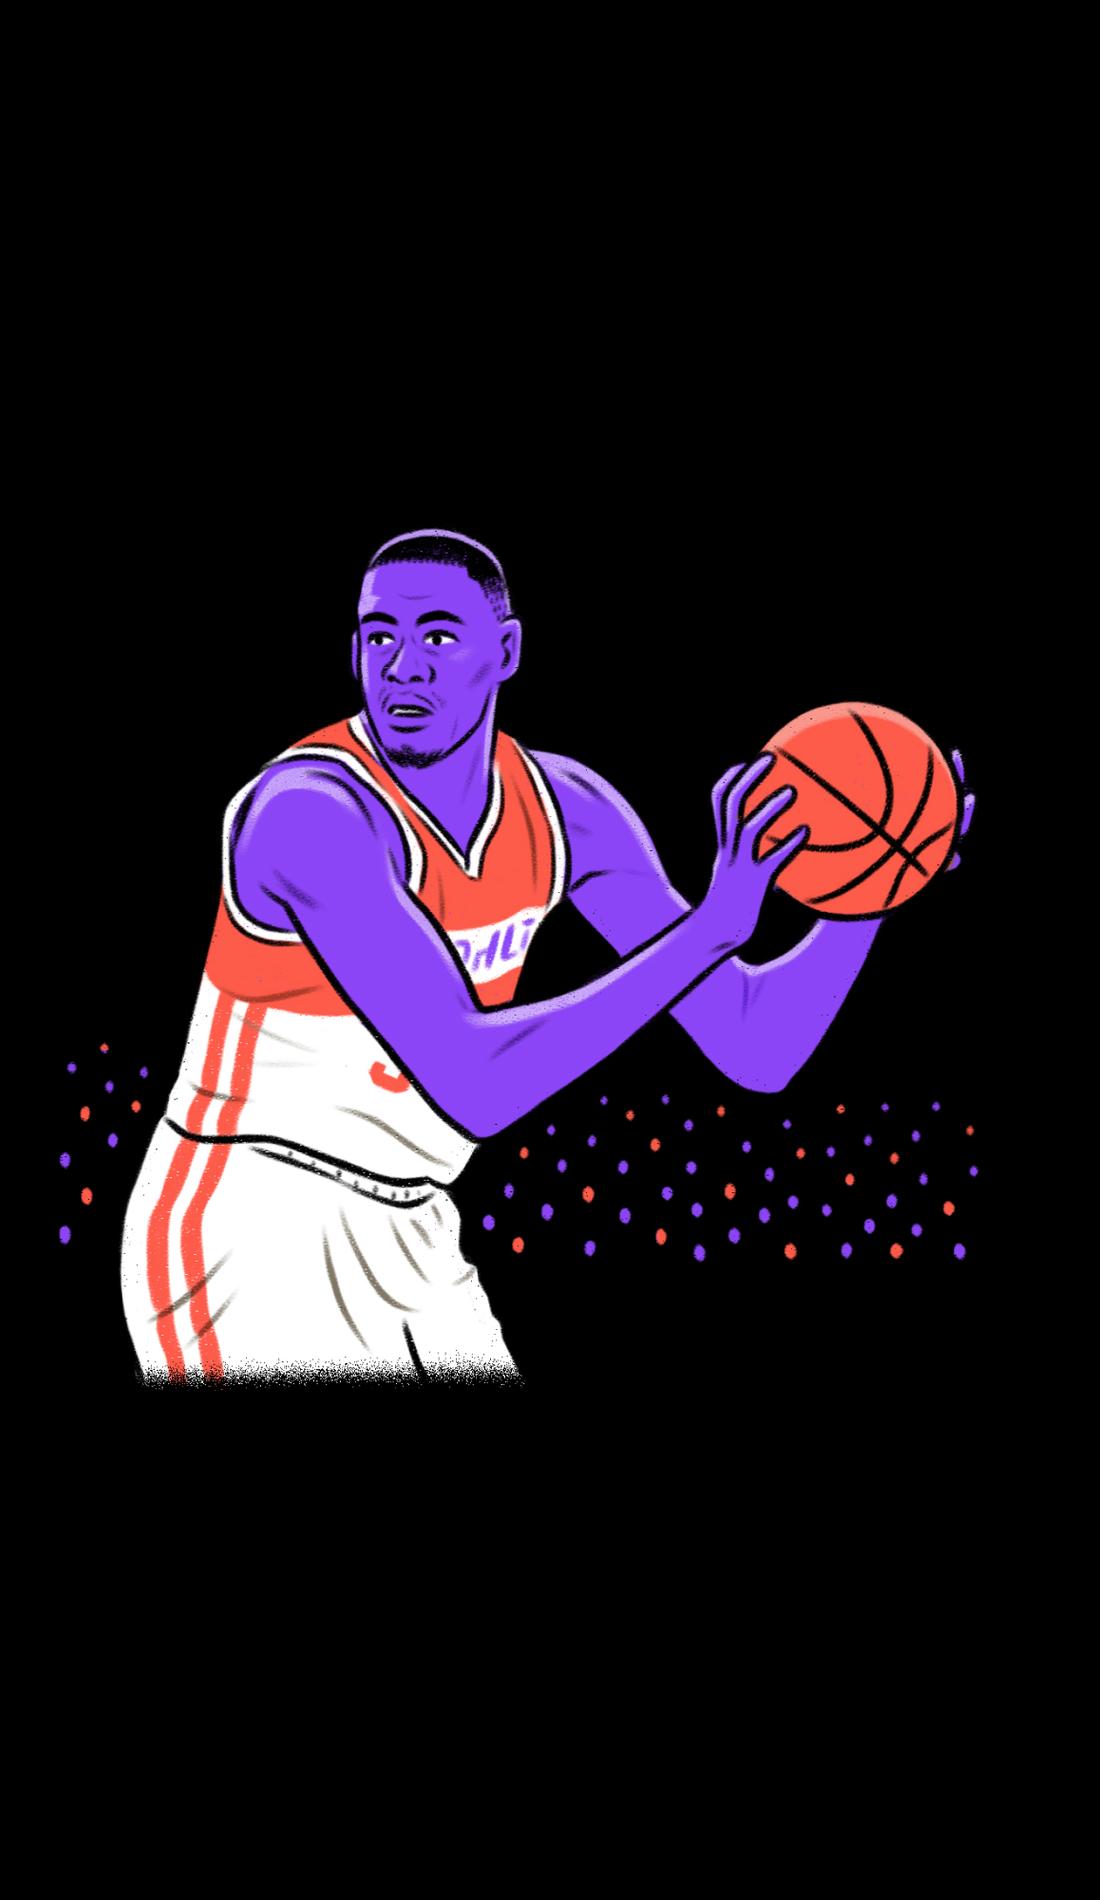 A UT Arlington Mavericks Basketball live event